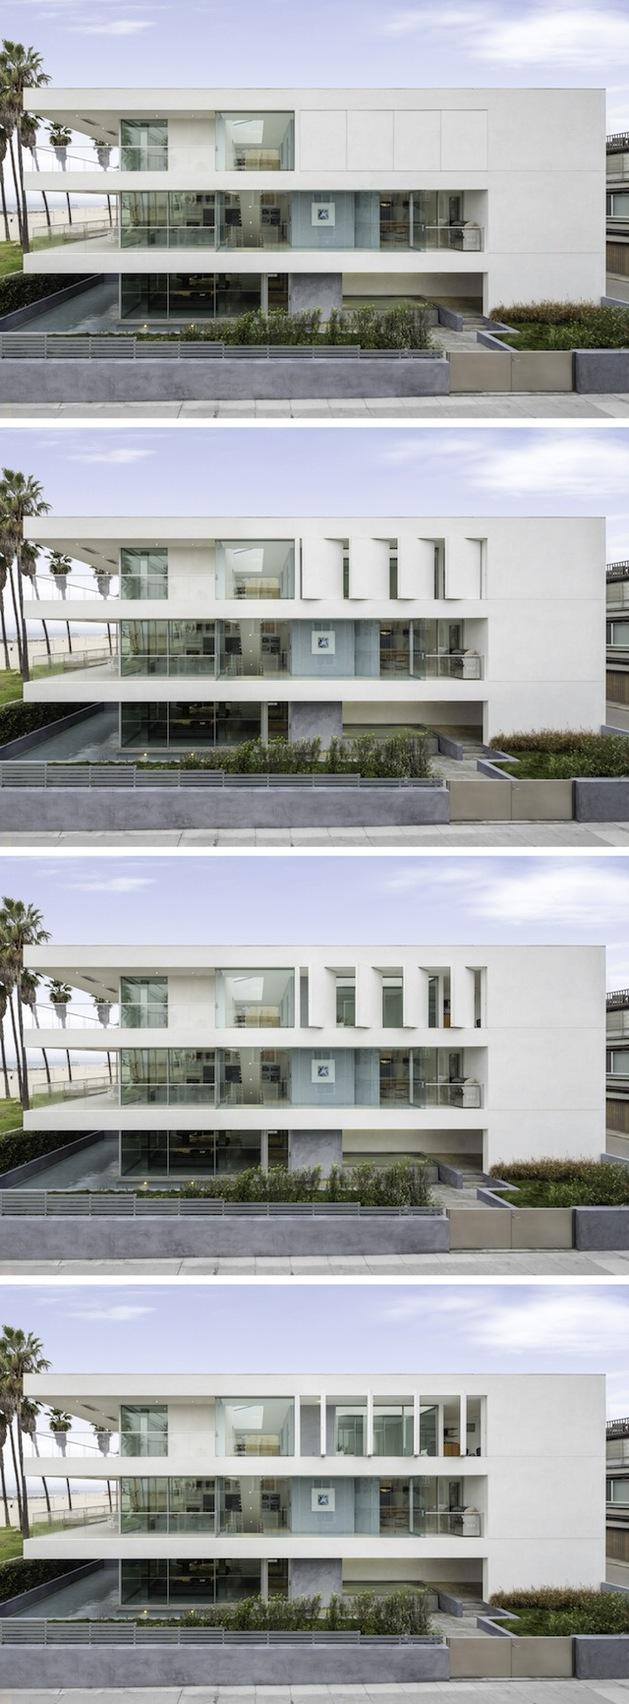 local-artists-multipurpose-california-beach-home-walkway-side.jpg